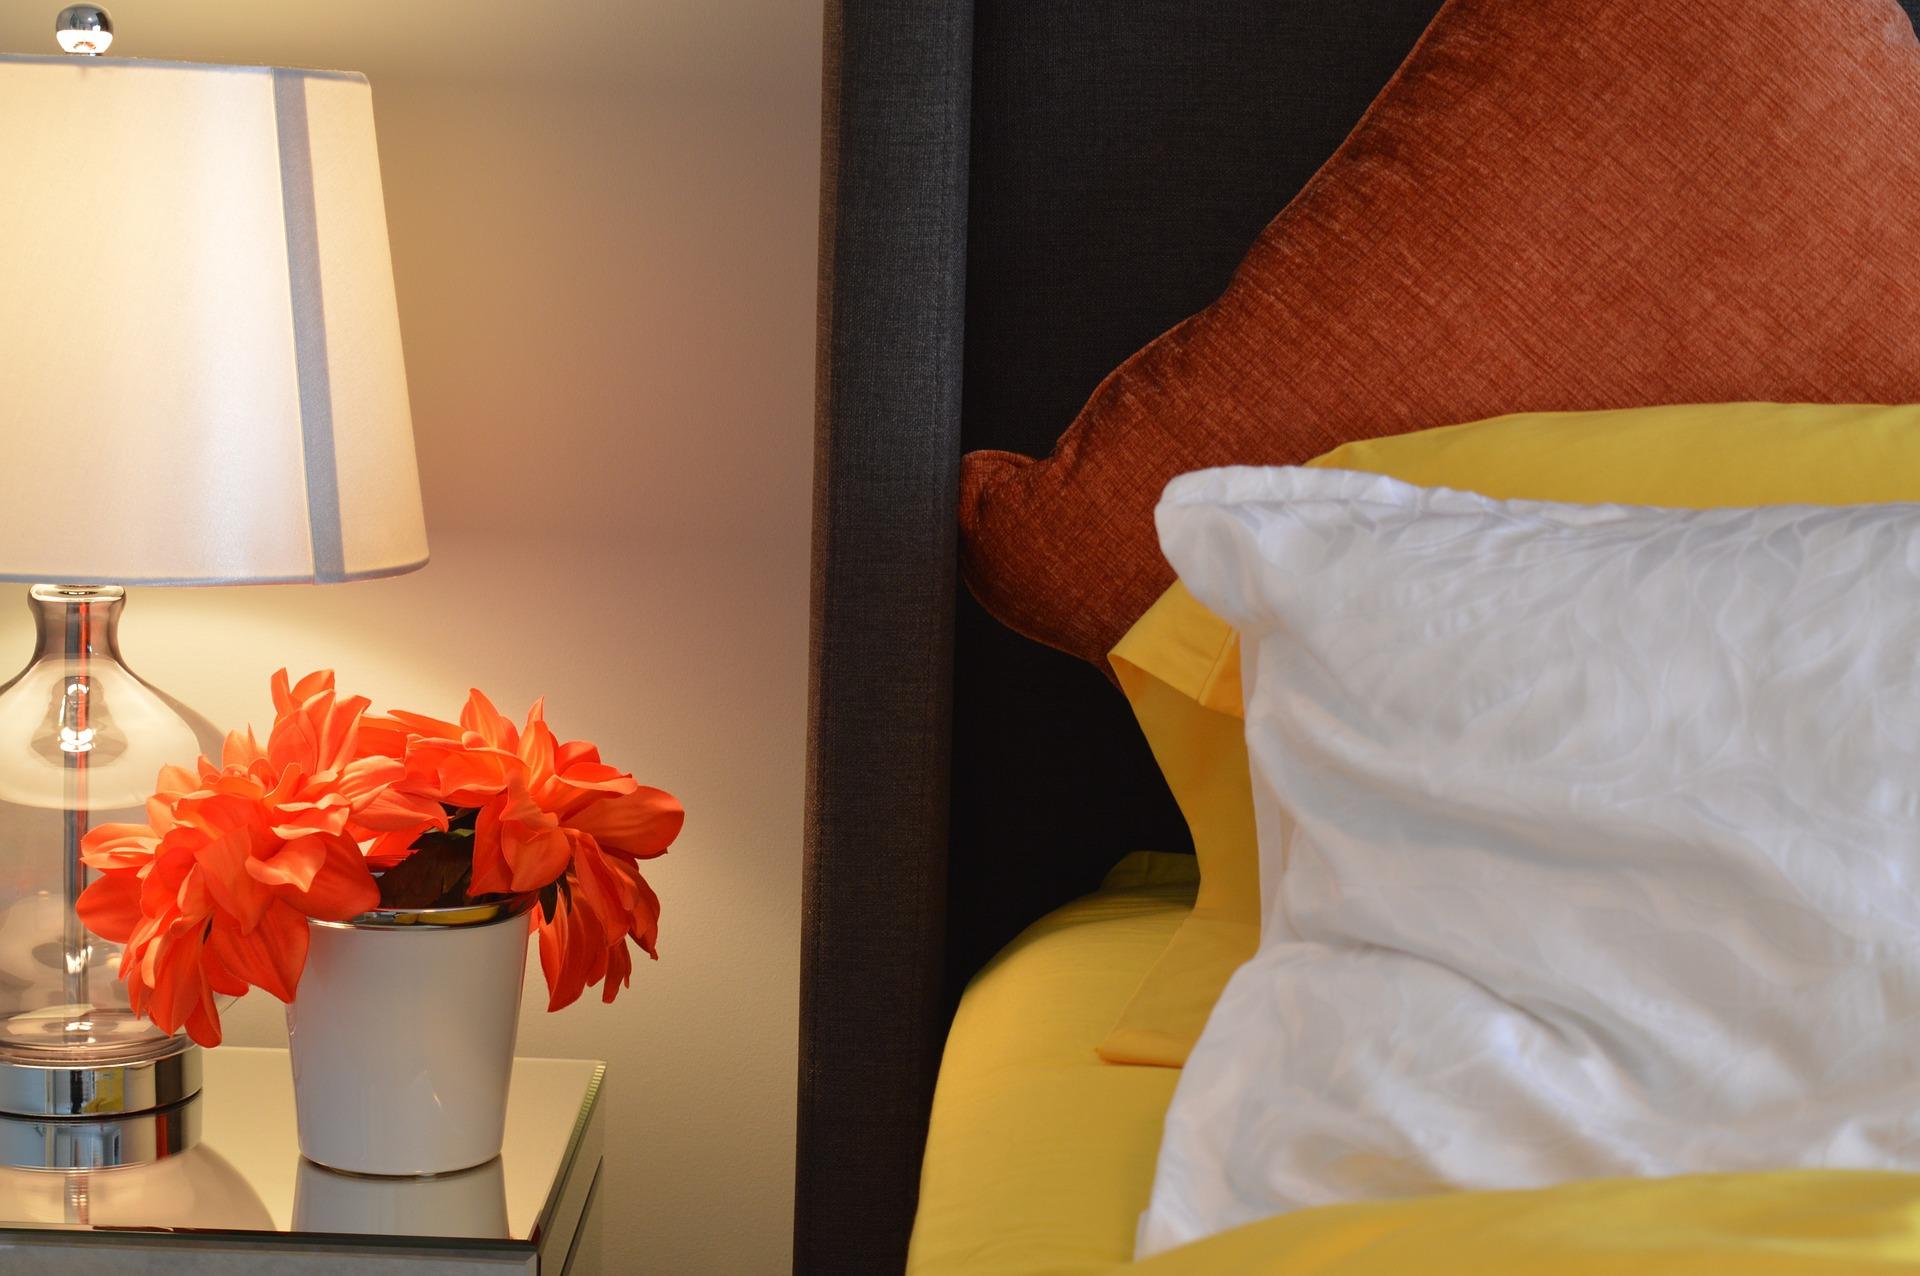 séjourner et hébergements-bed © ErikaWittlieb de Pixabay